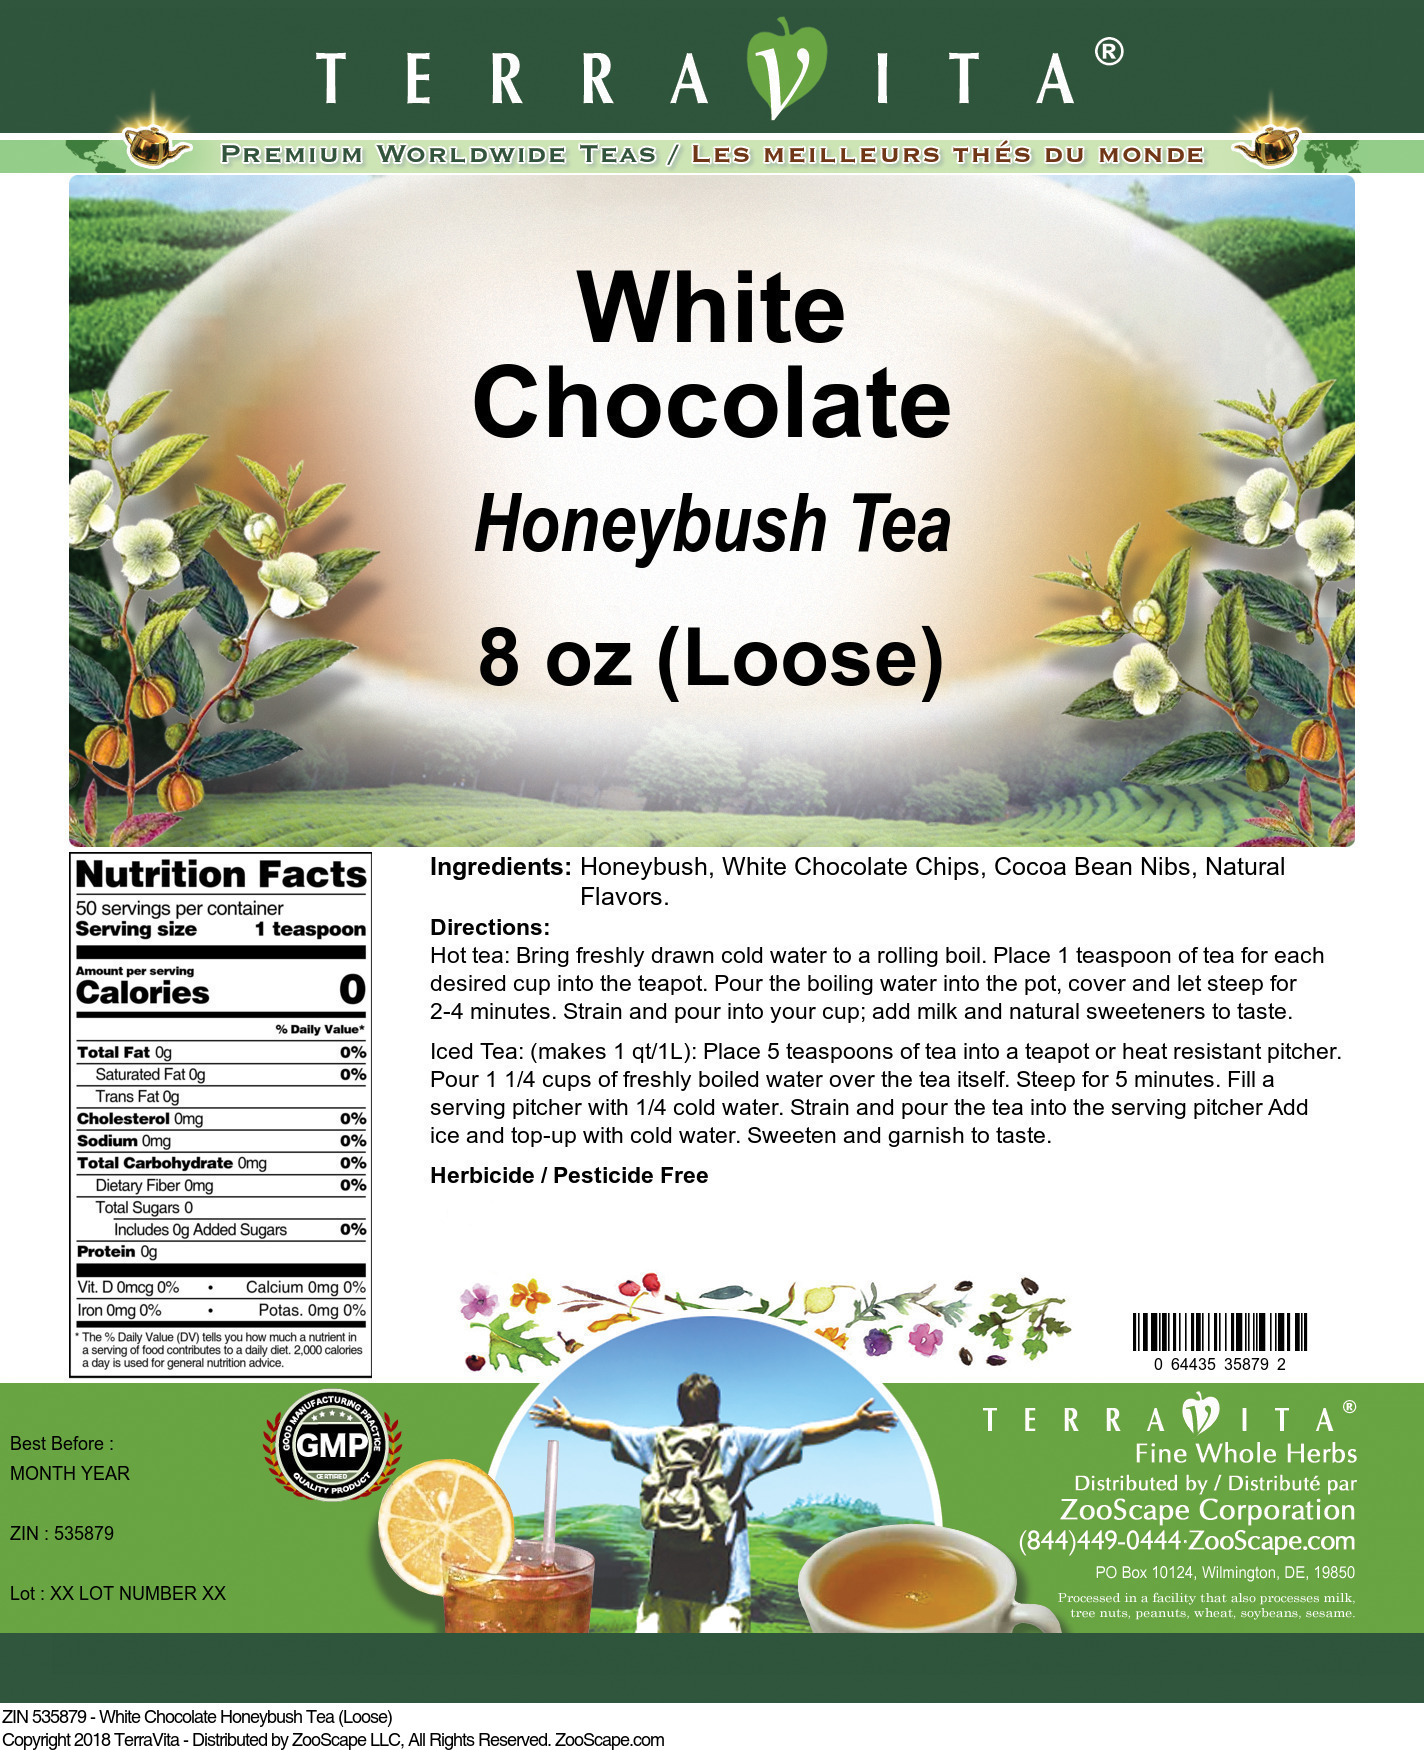 White Chocolate Honeybush Tea (Loose)